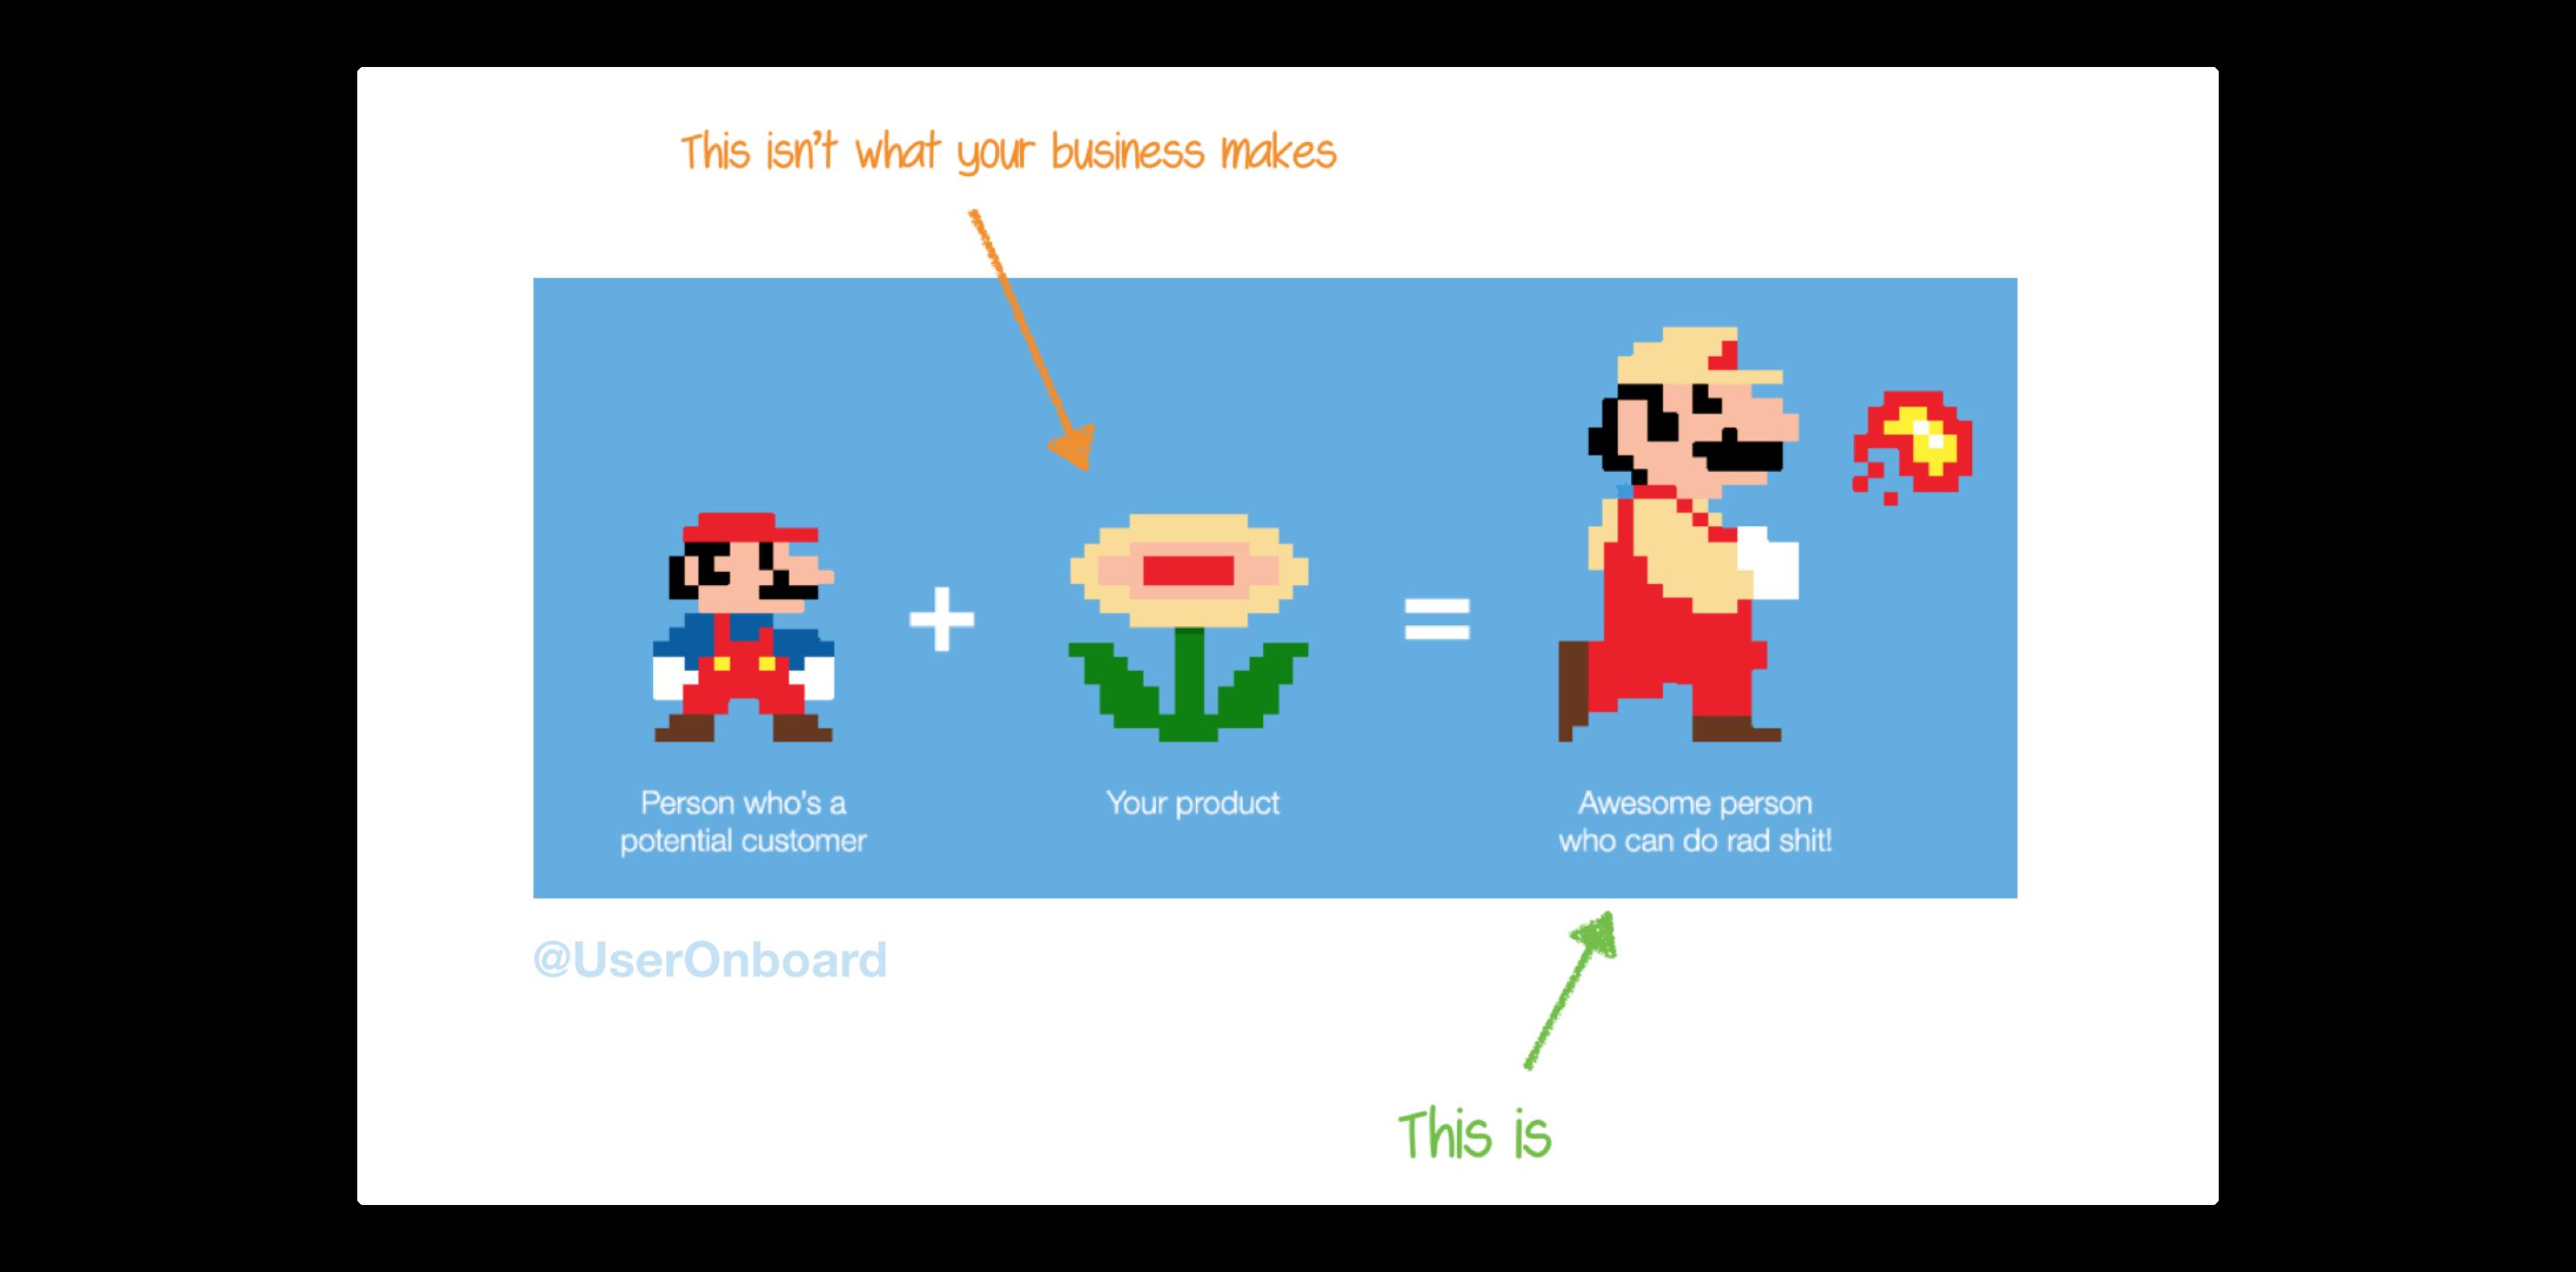 mario illustration of customer gaining superpowers